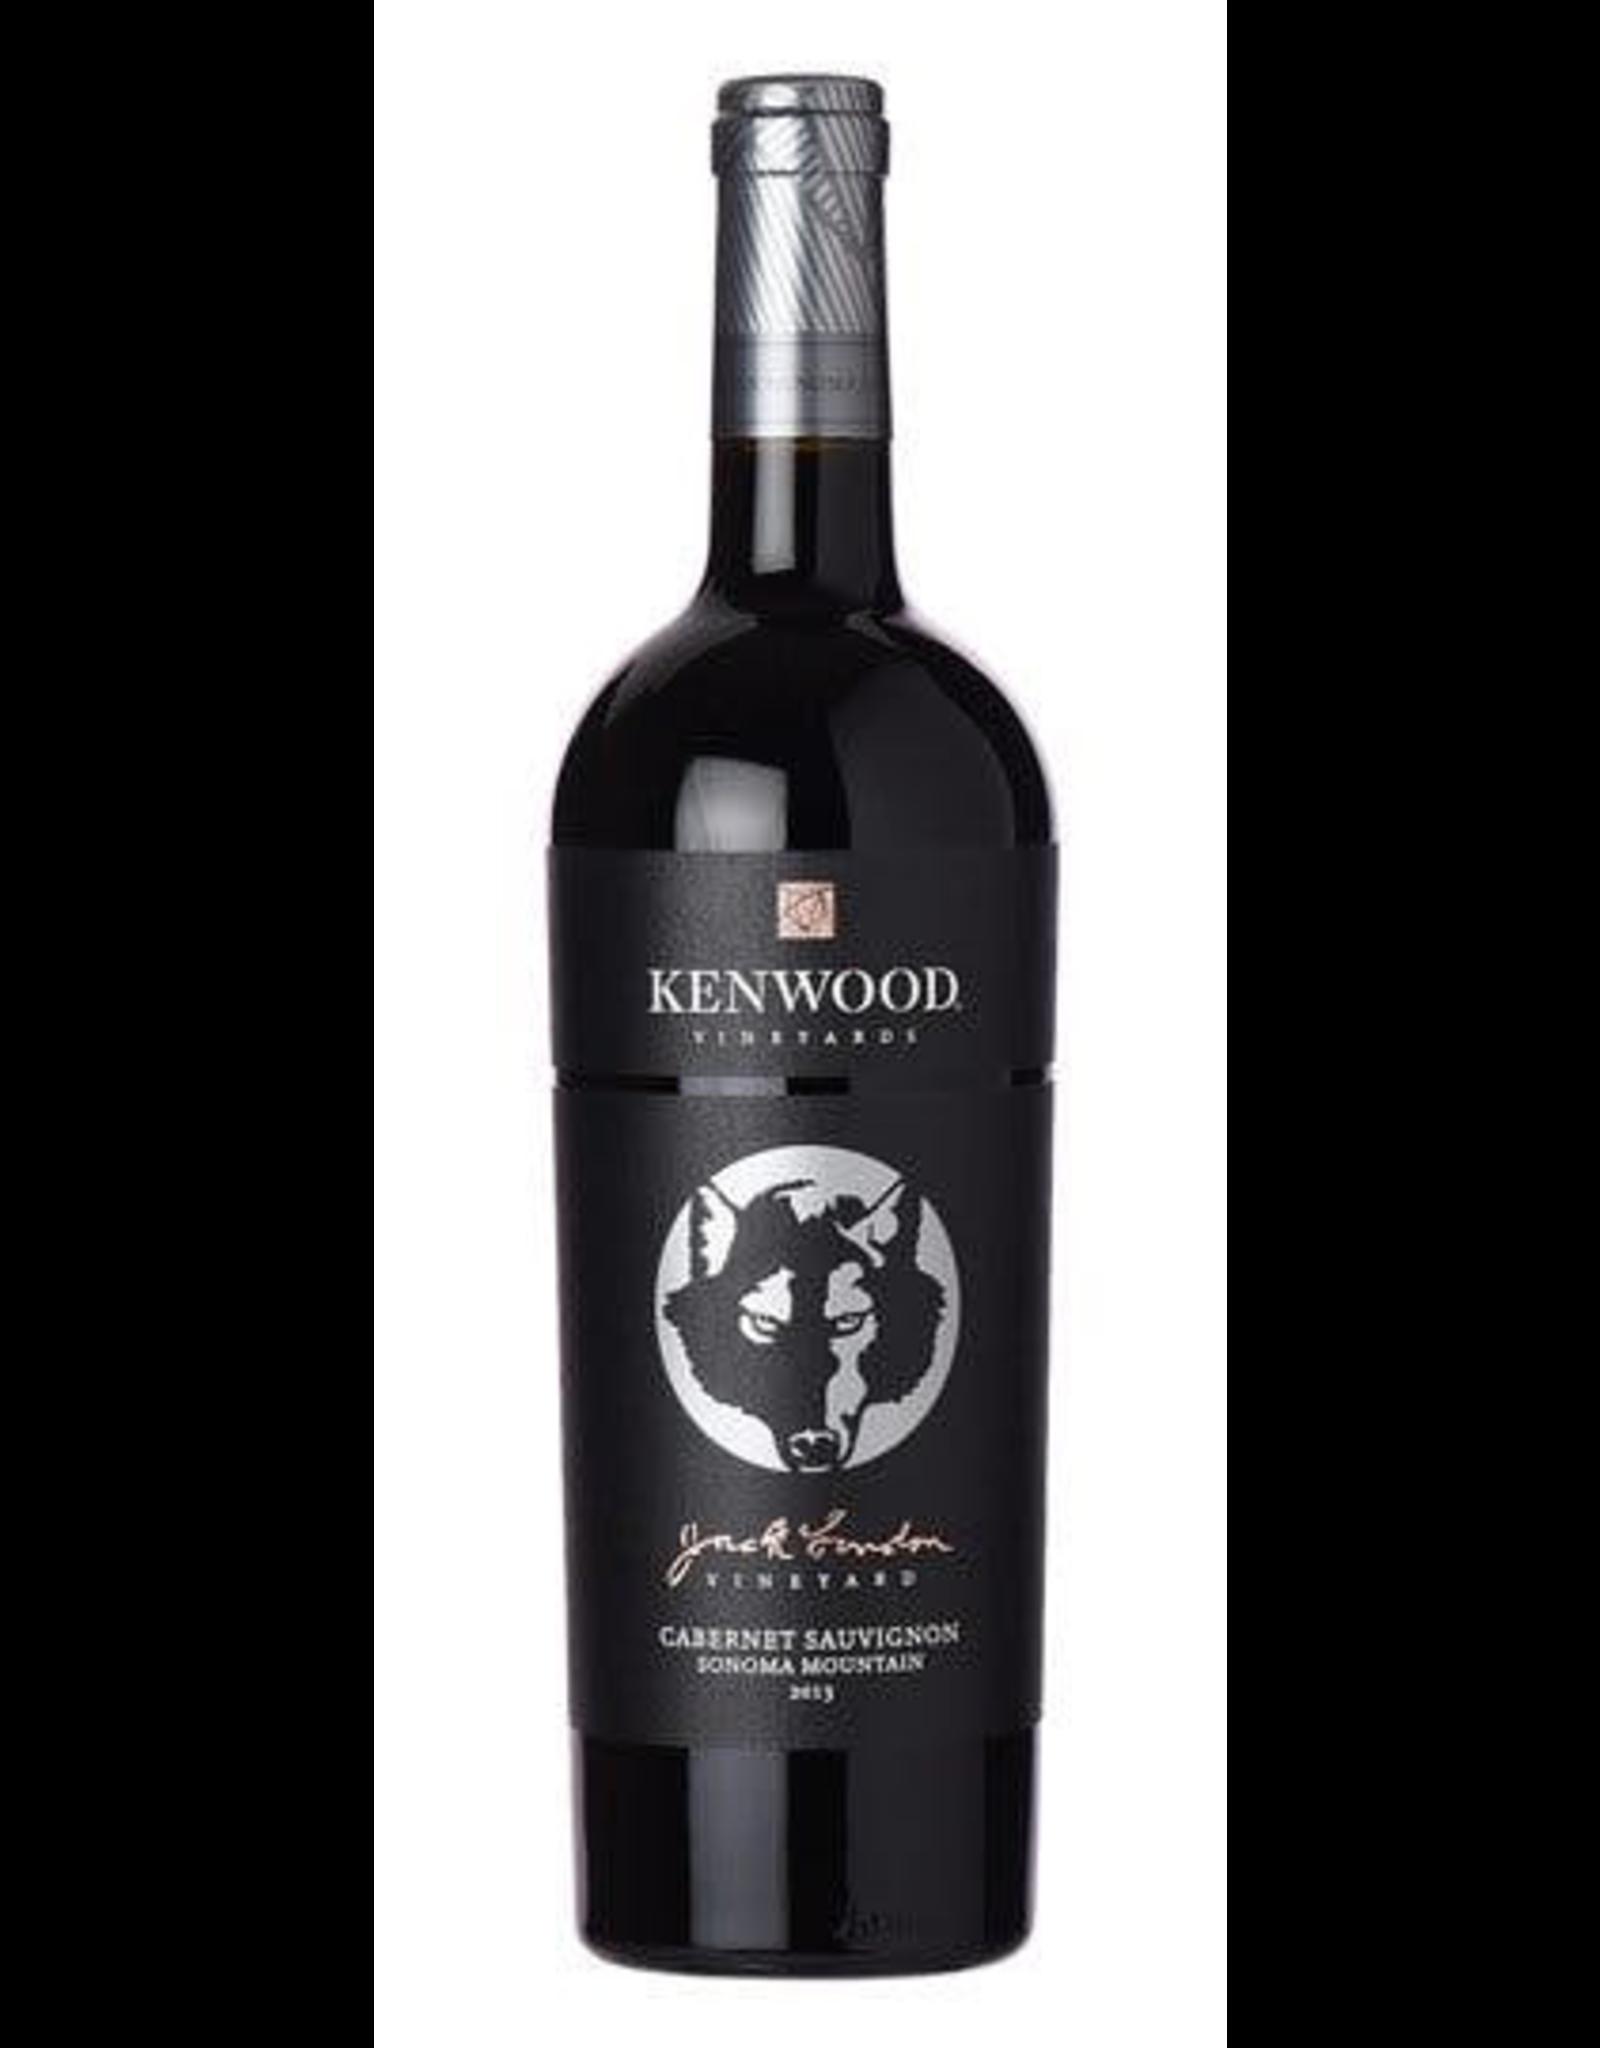 White Wine 2015, Kenwood Jack London, Cabernet Sauvignon, Sonoma Mountain, Sonoma, California, 14.5% Alc, CT